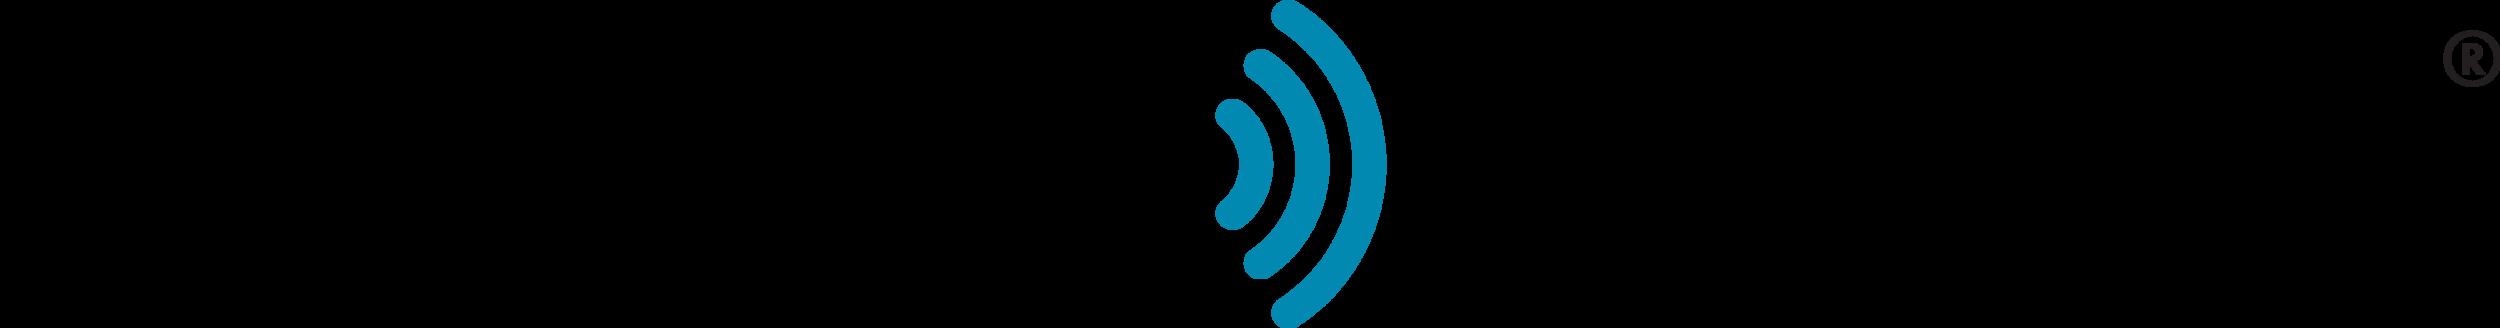 Workloud_Logo_Revised.png